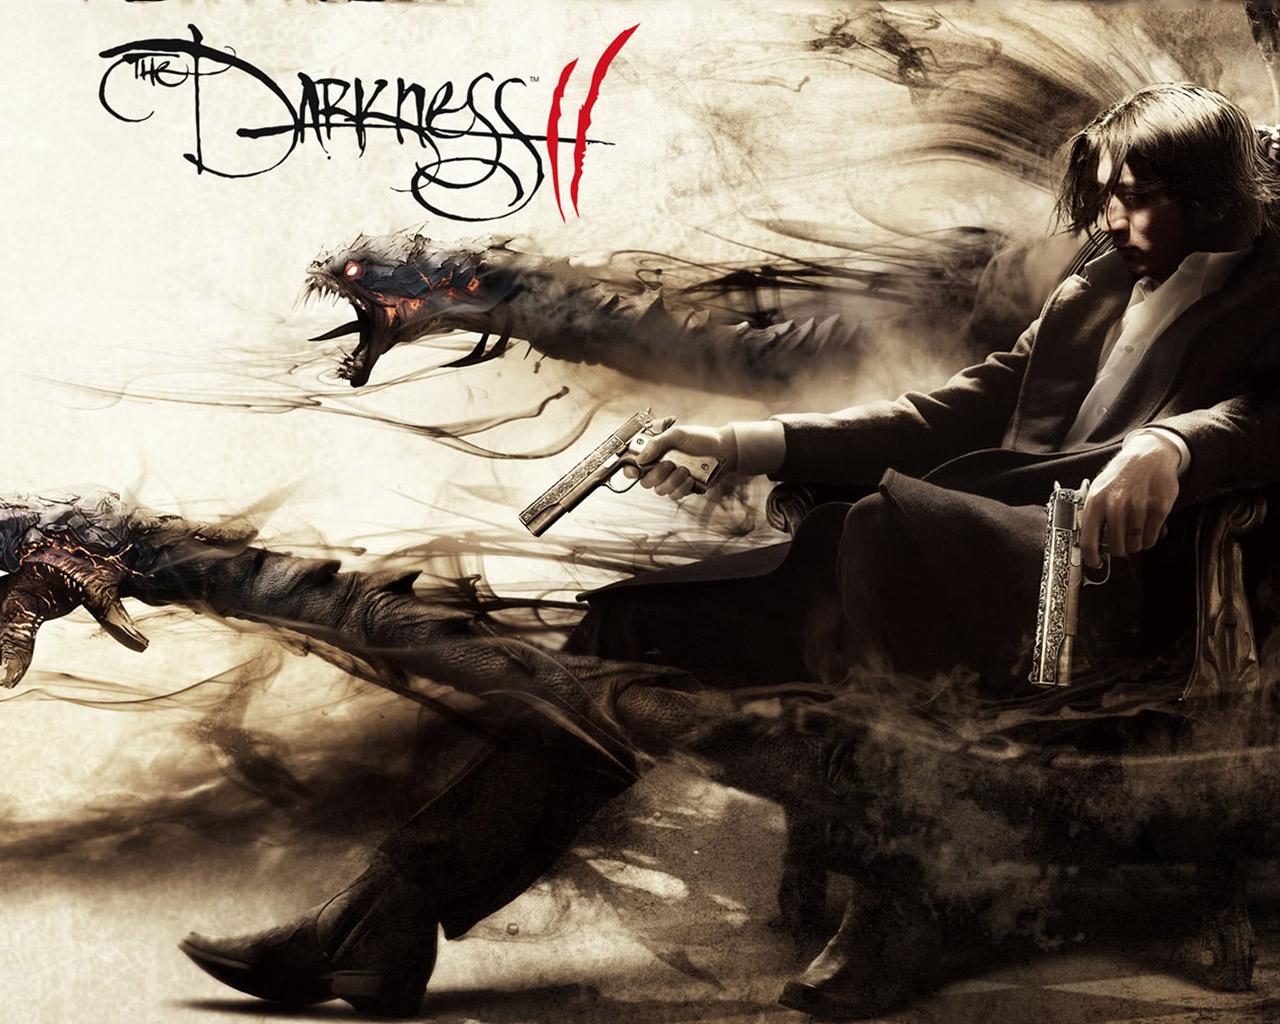 The Darkness II Wallpaper in 1280x1024